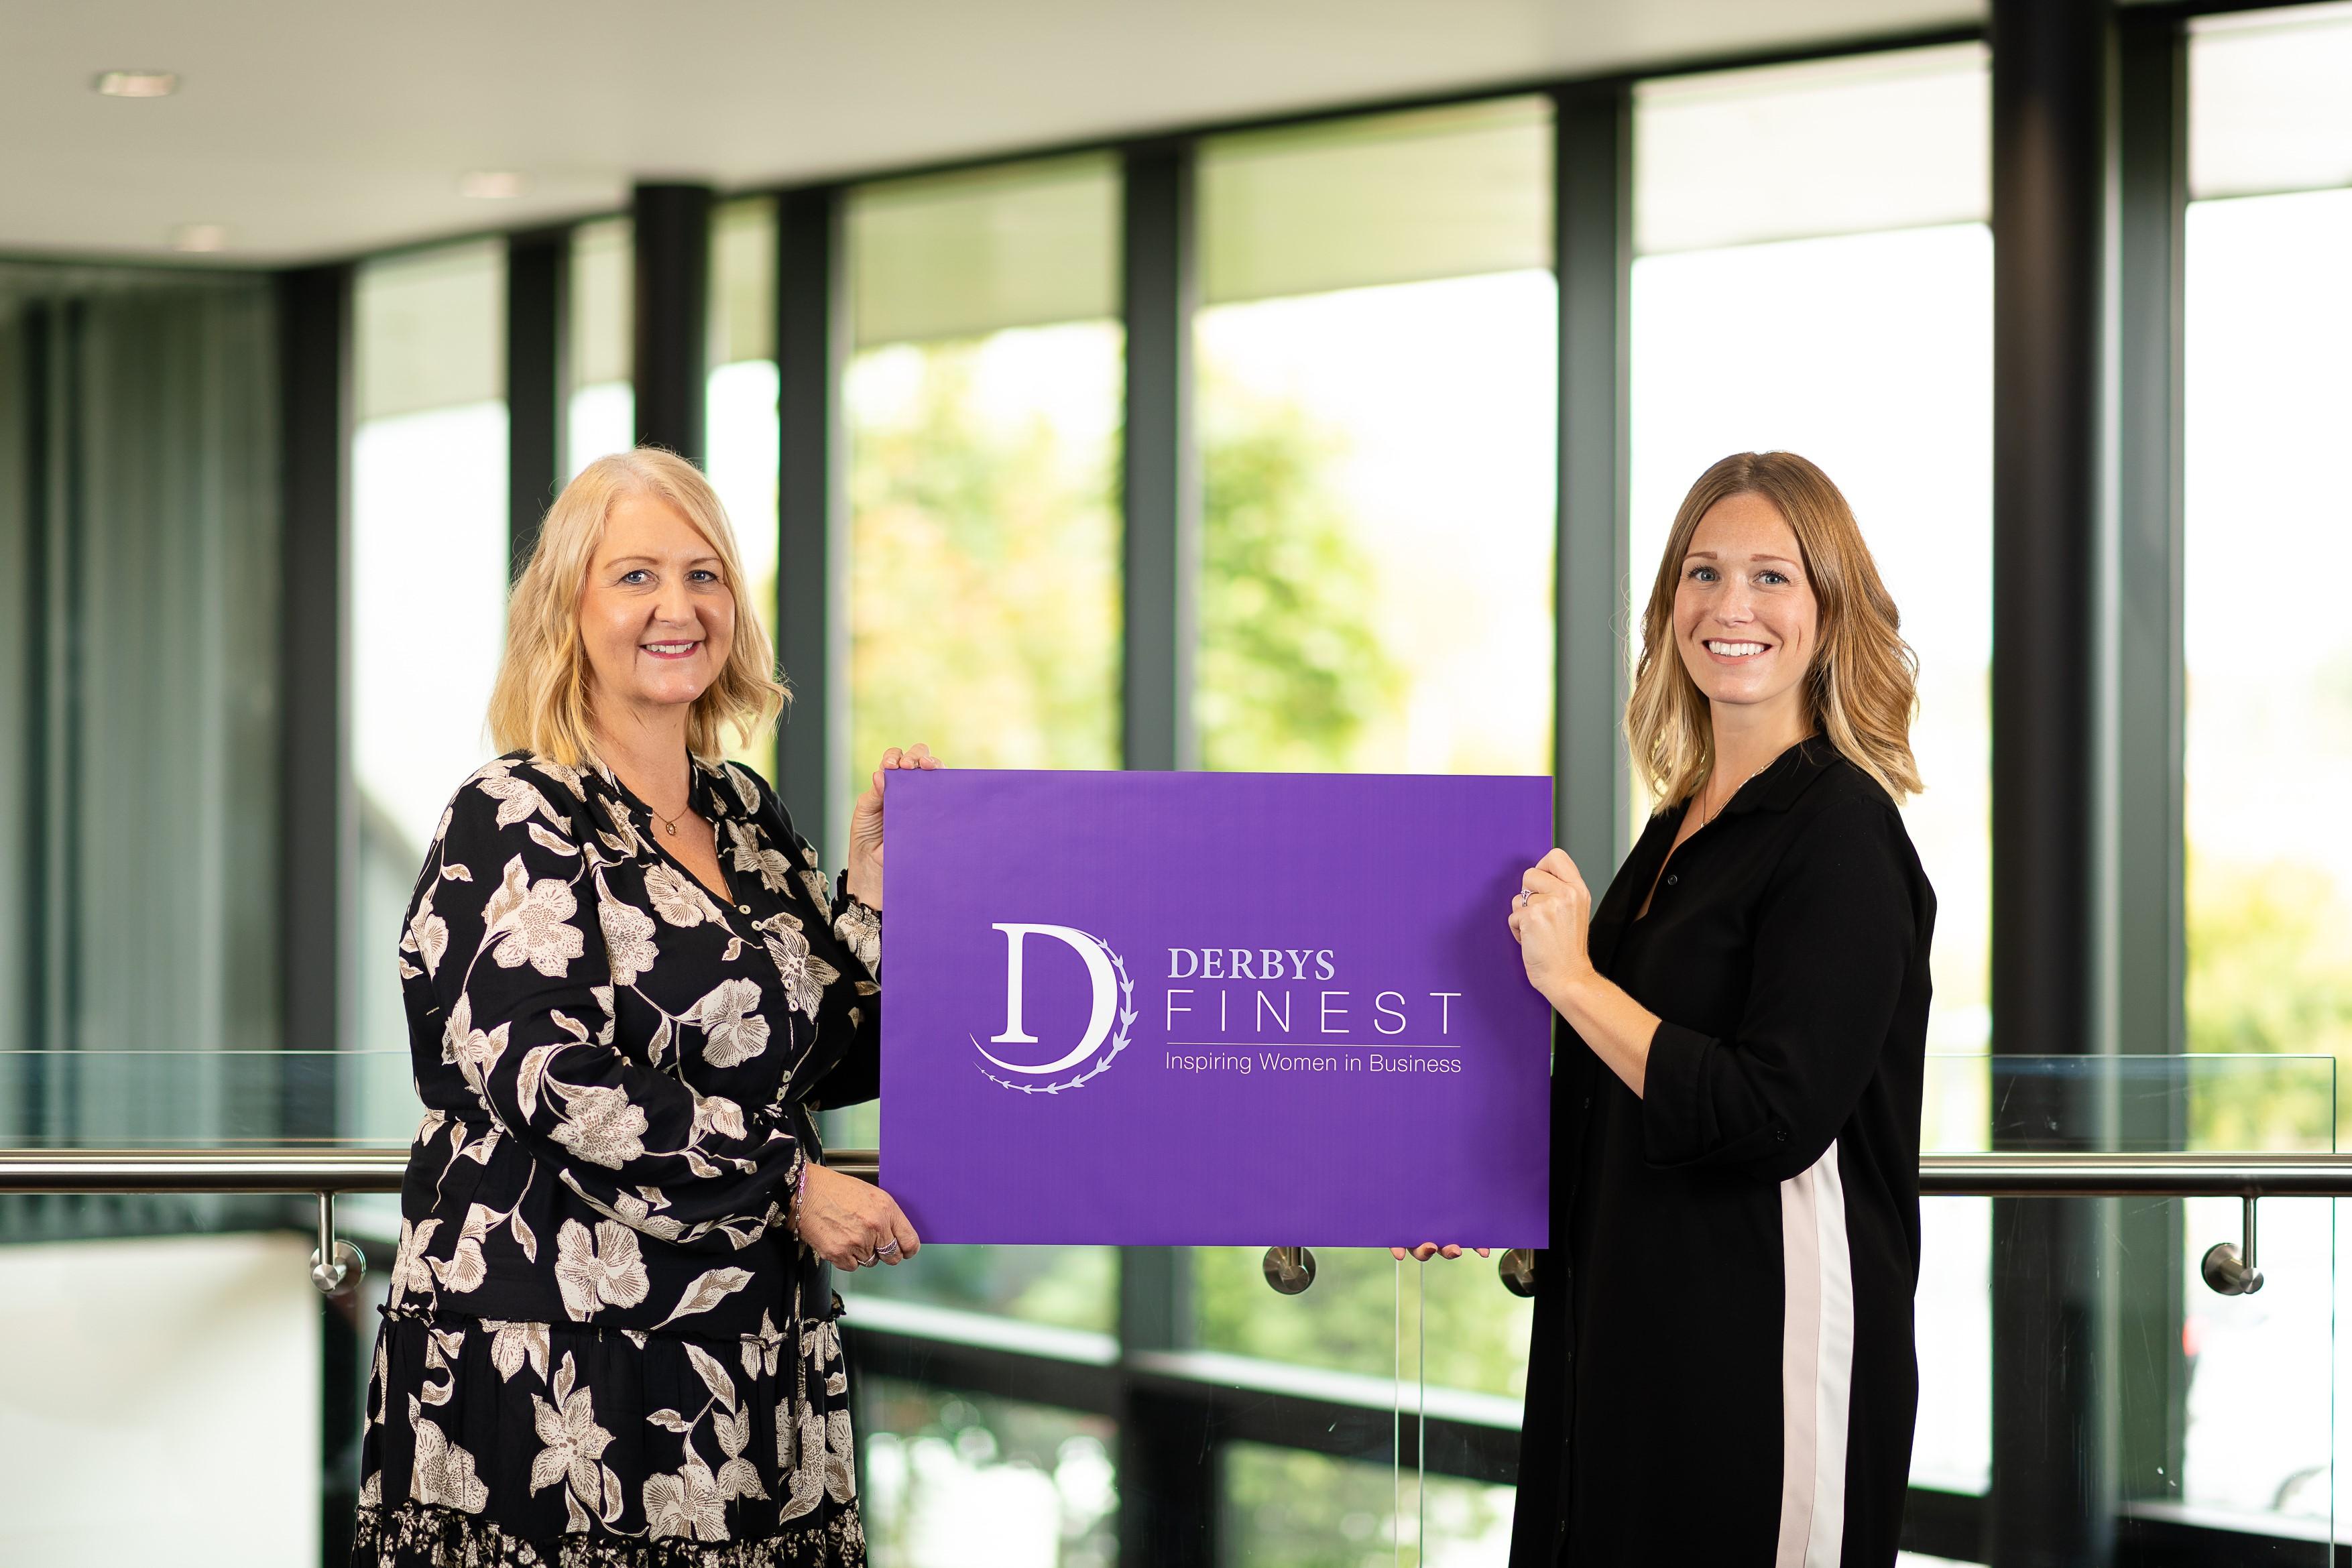 Local Entrepreneur Supports Derbys Finest Re-brand